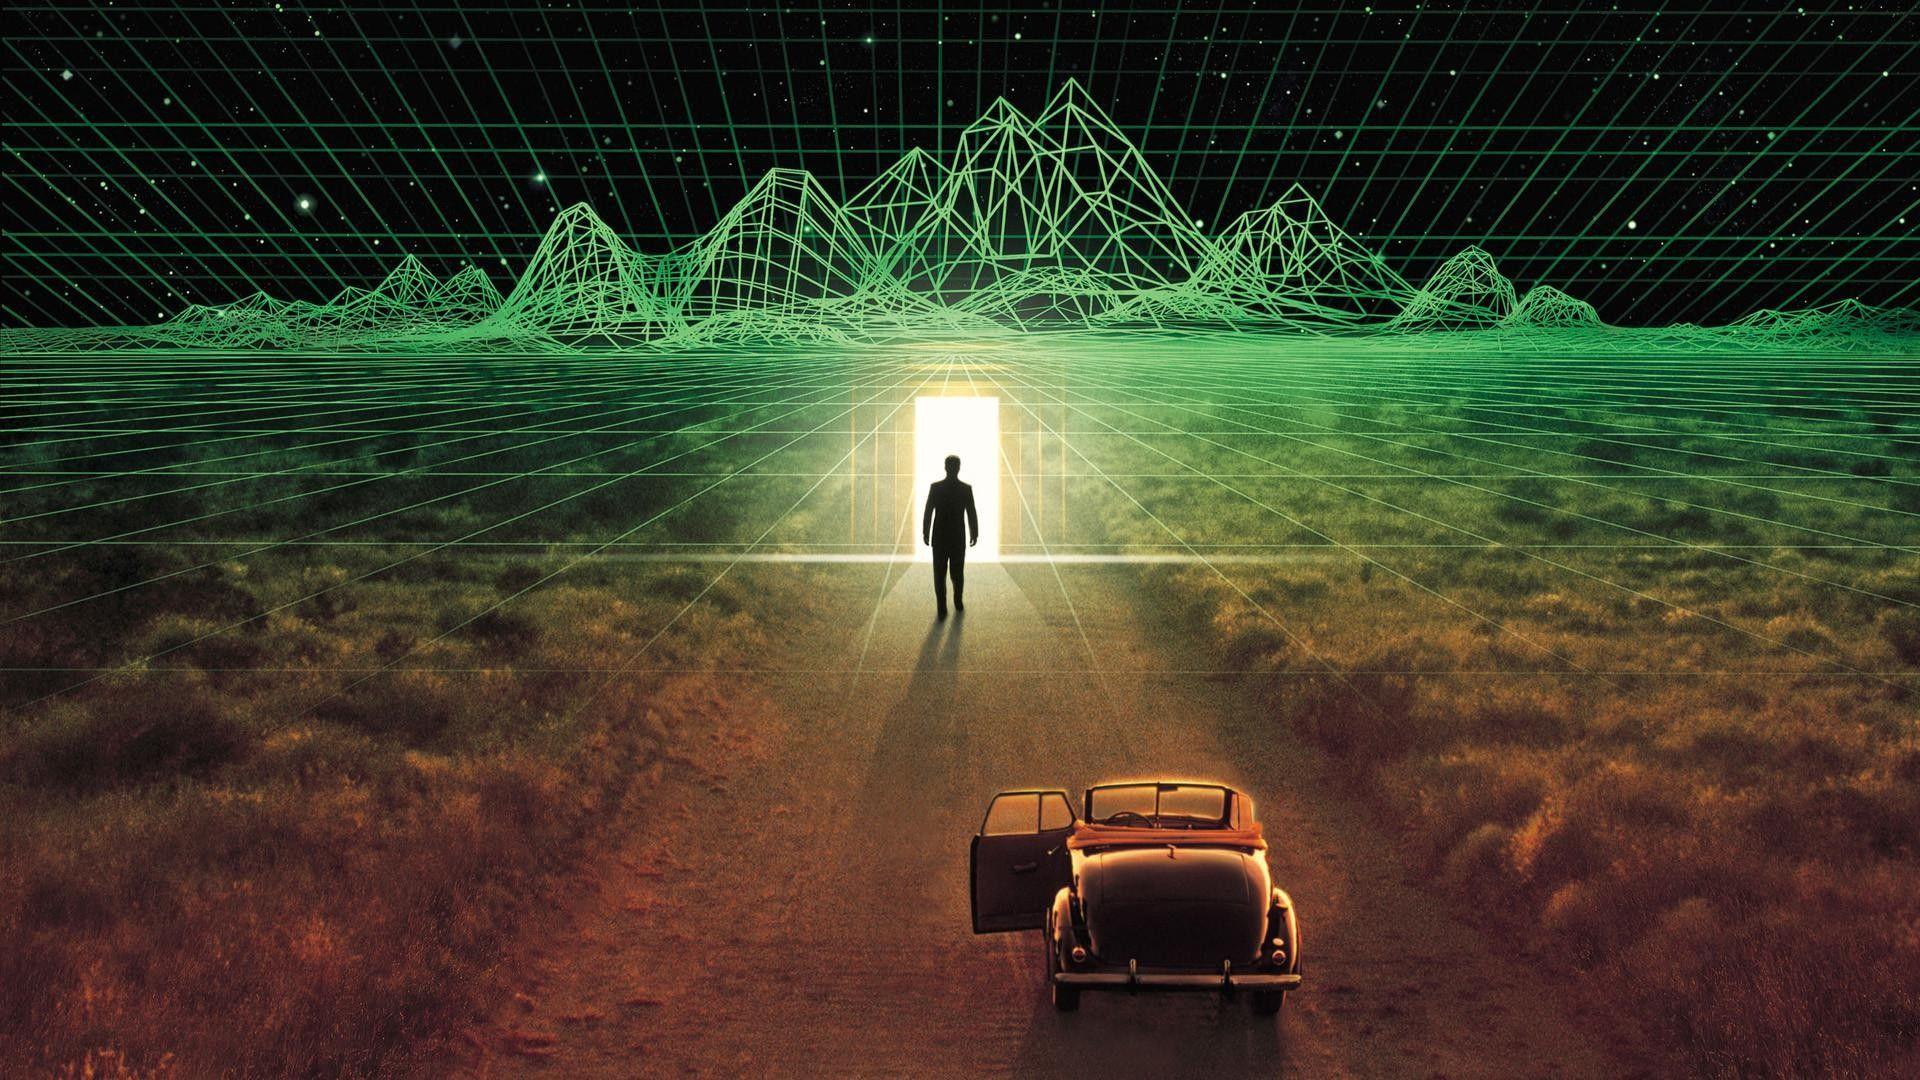 Movies The Thirteenth Floor Abstract Wallpaper Thirteenth Floor Simulation Theory Synthwave